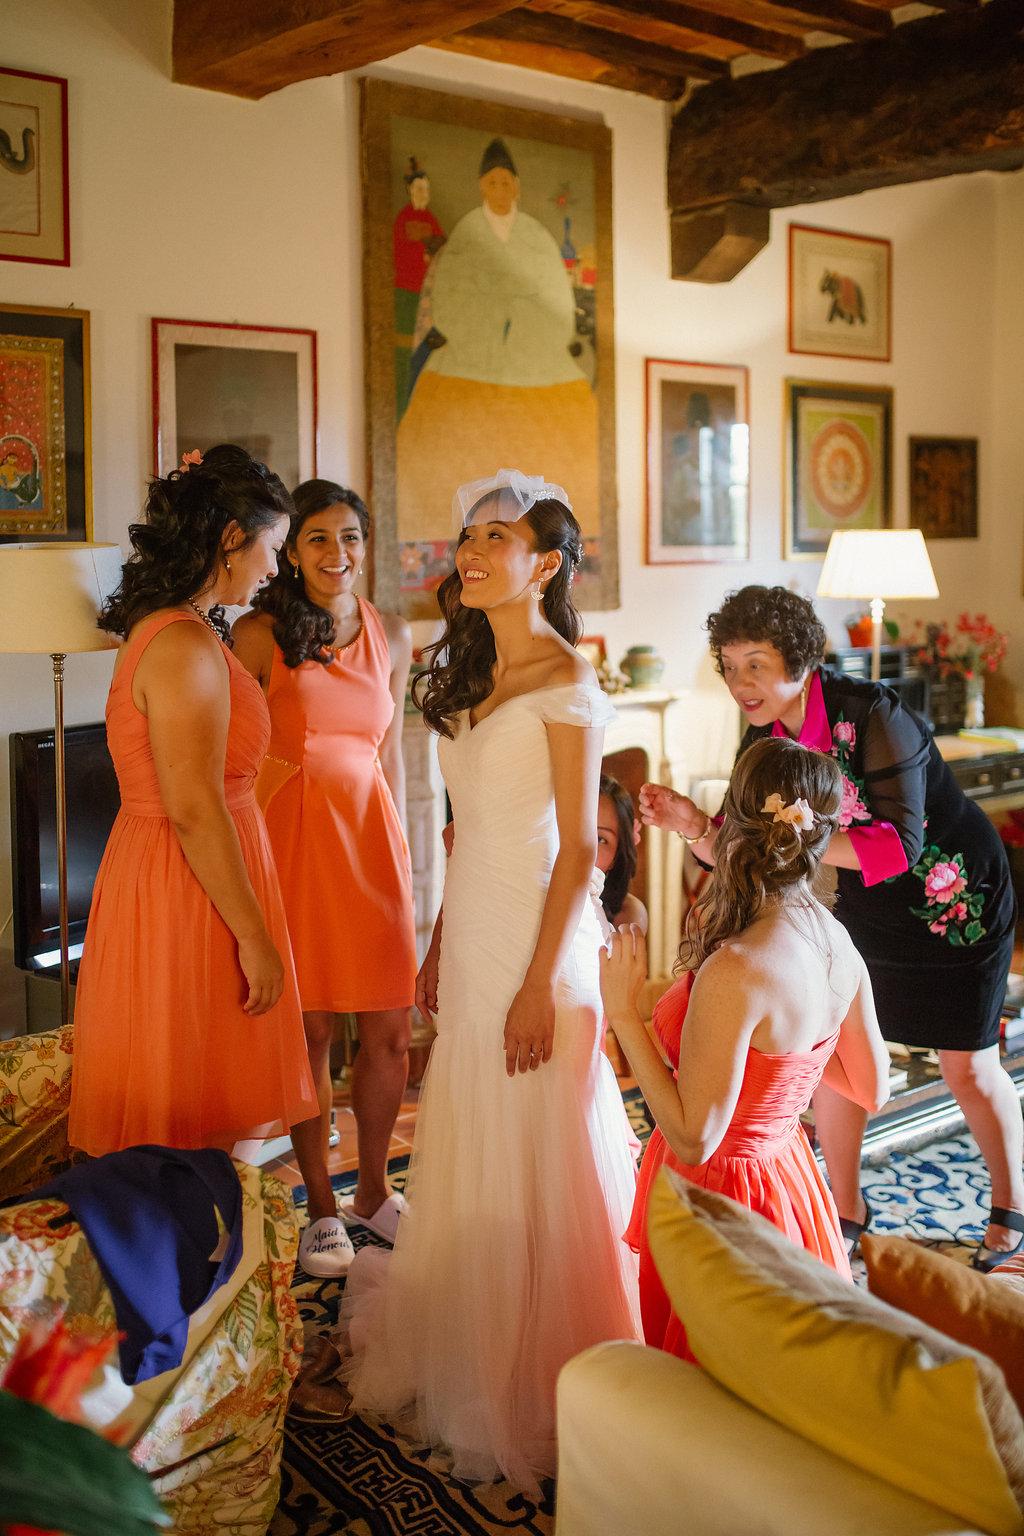 Bride is getting ready, destination wedding in Tuscany villa